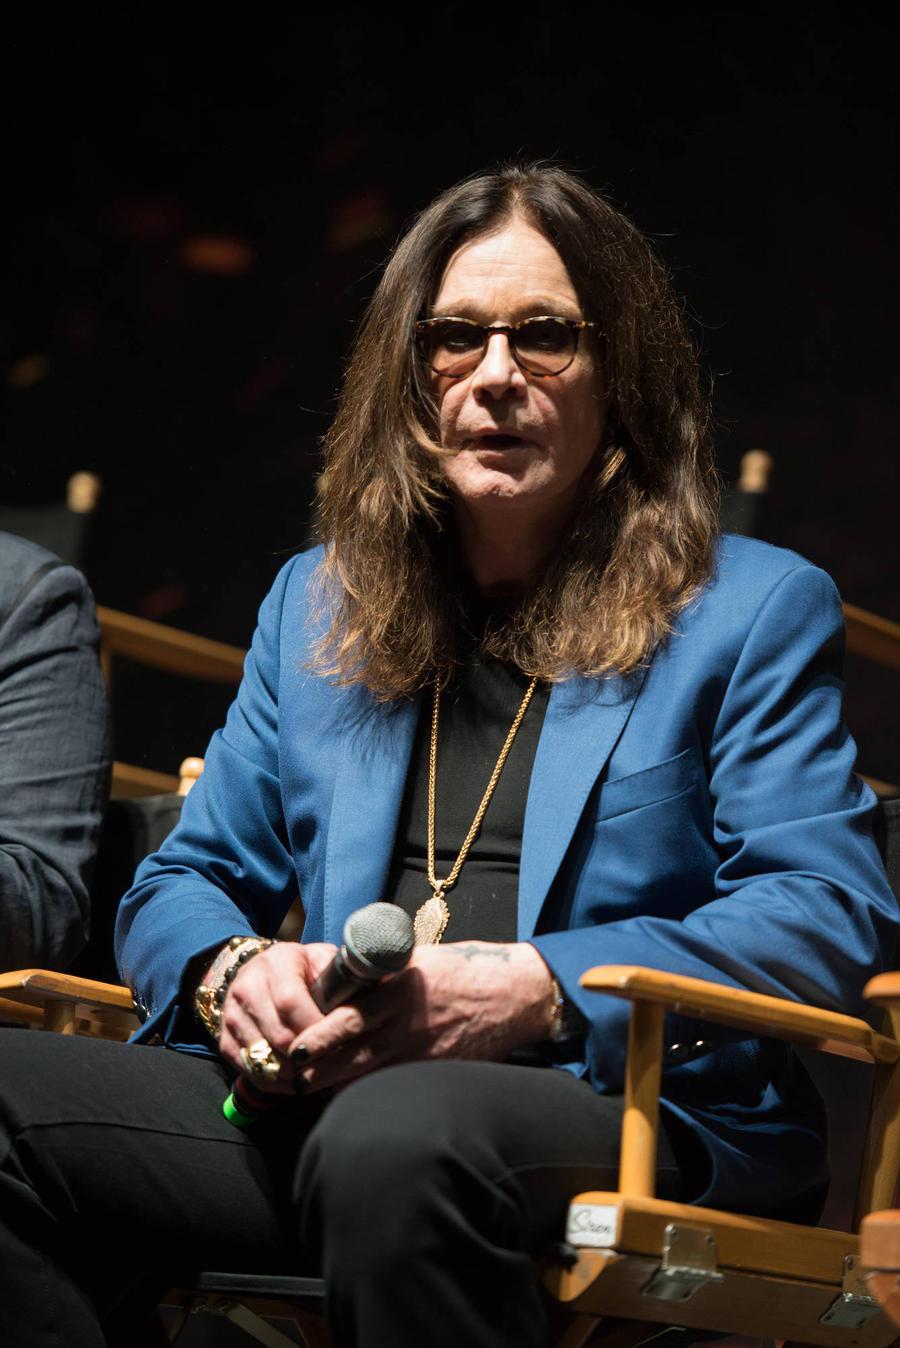 Ozzy Osbourne Blasts 'Publicity Stunt' Reports Surrounding Sharon Osbourne Split